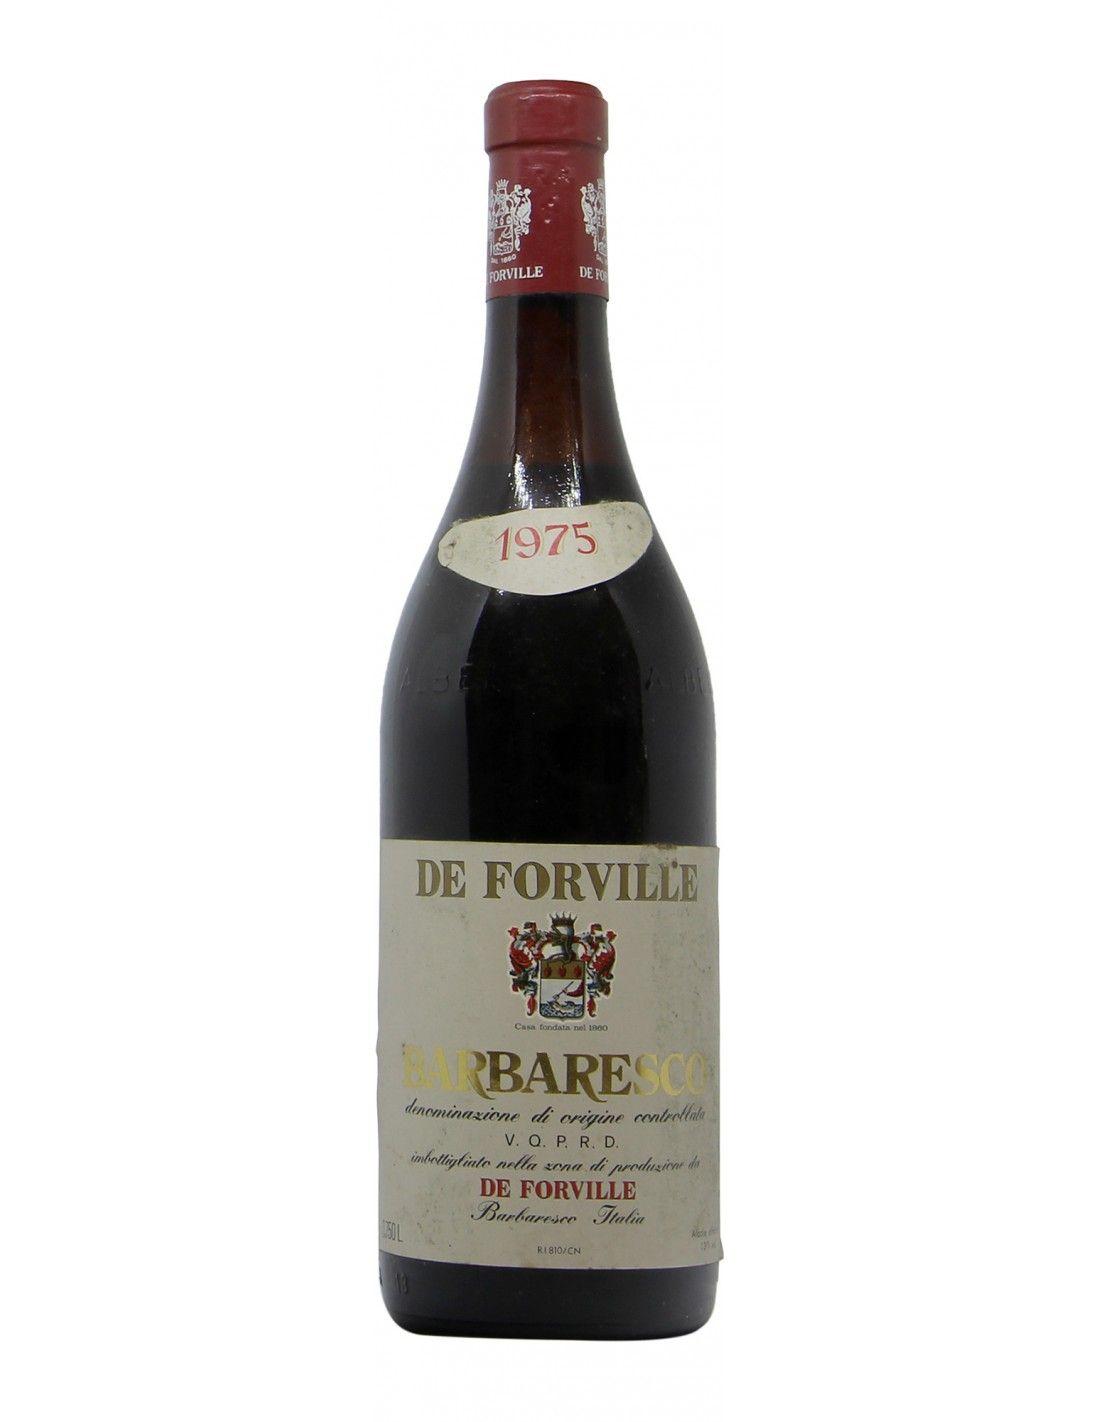 BARBARESCO 1975 DE FORVILLE Grandi Bottiglie